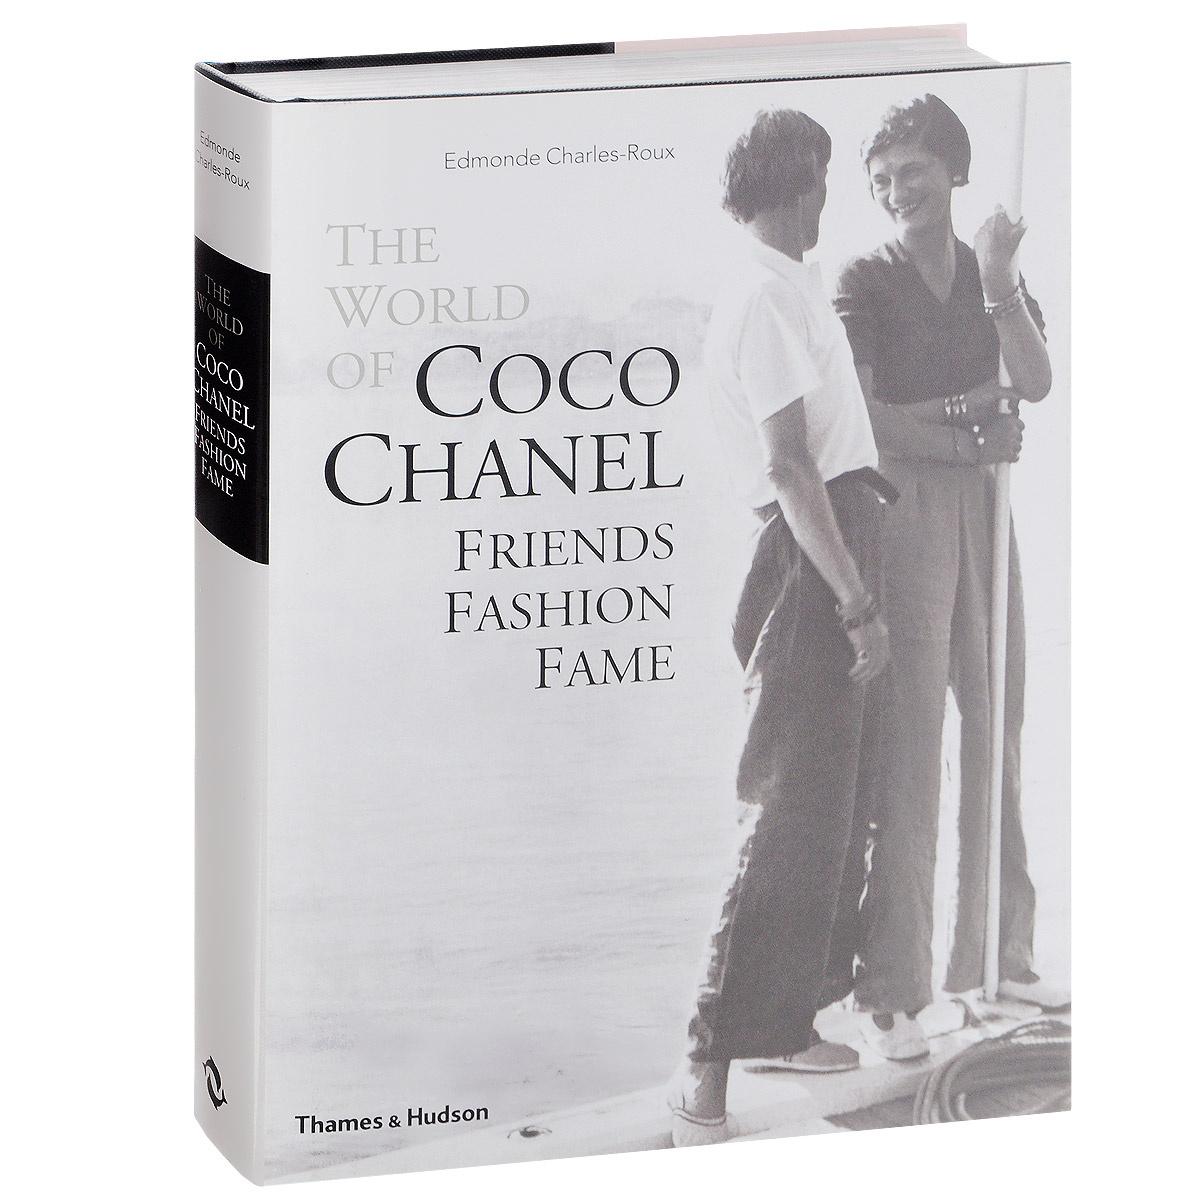 The World of Coco Chanel: Friends, Fashion, Fame   Шарль-Ру Эдмонда #1